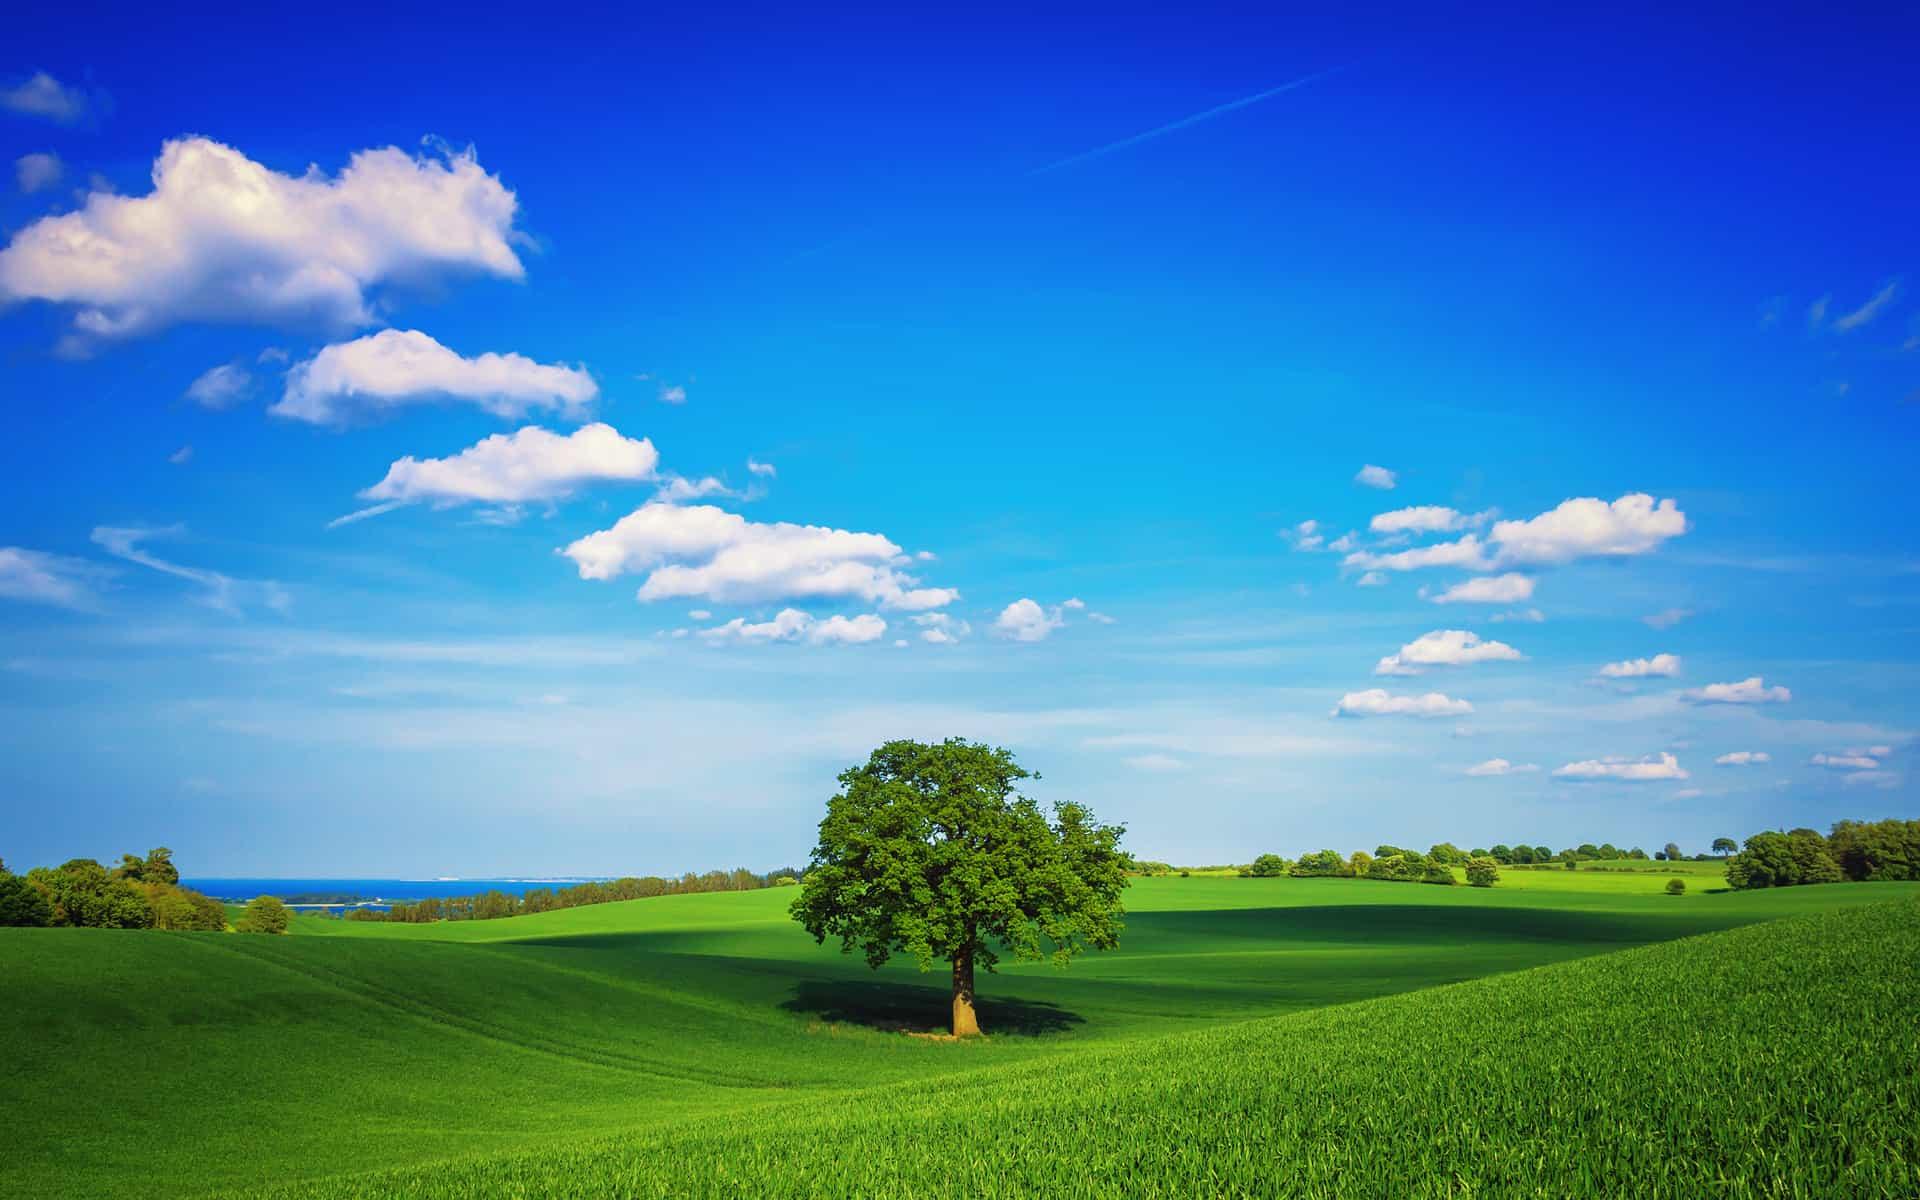 nature wallpapers mp3 download: 6876494-landscape-photos